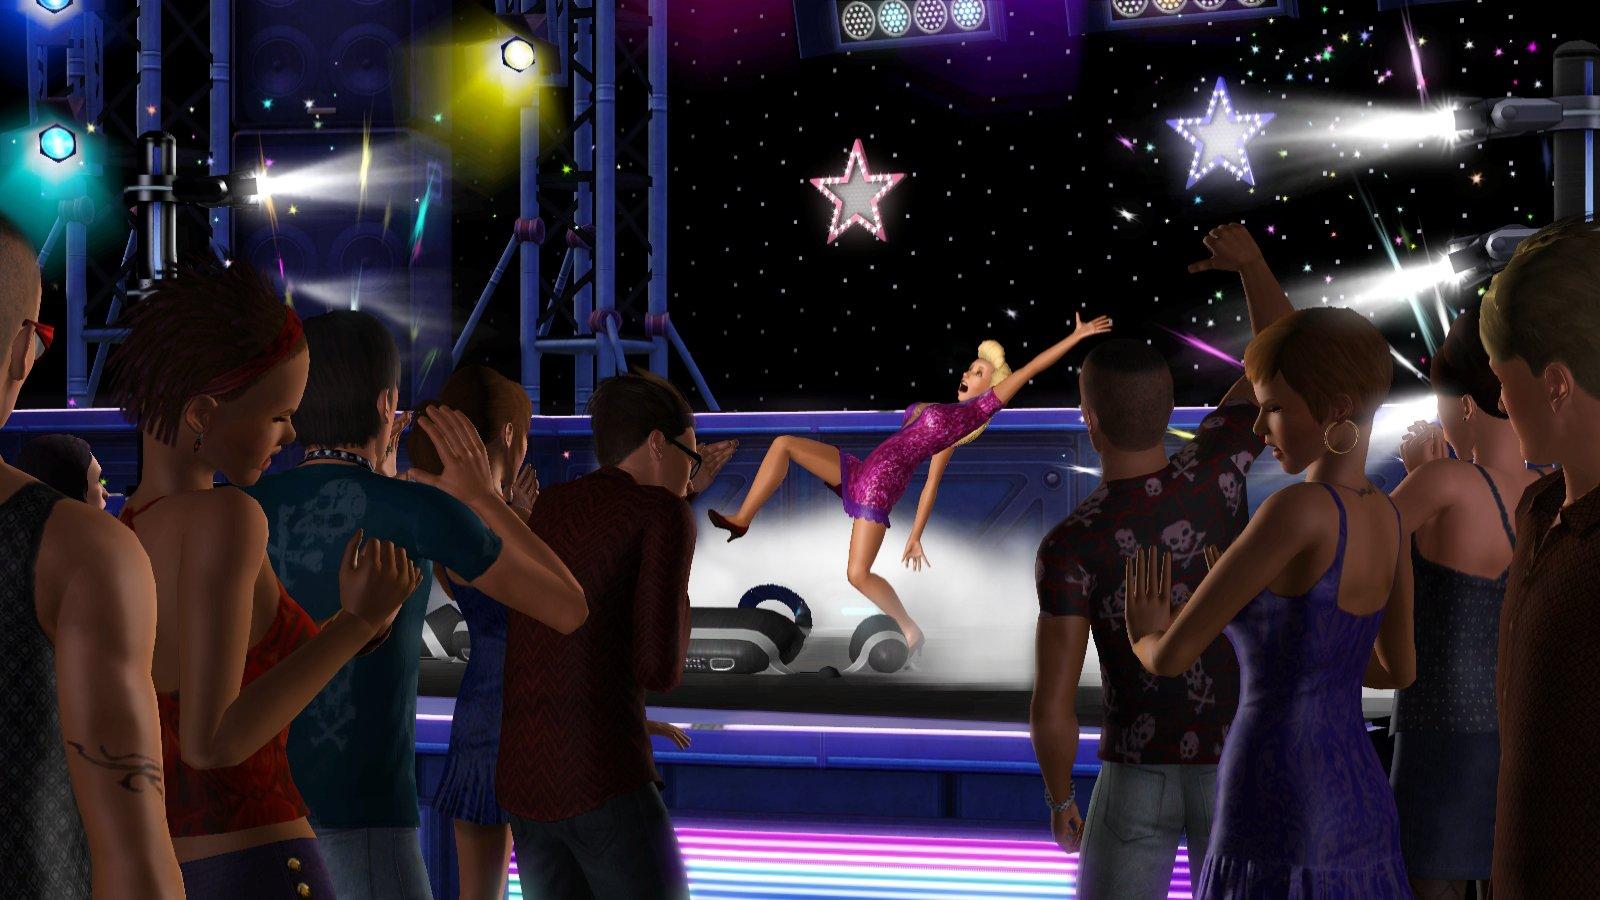 В дополнении the sims 3 шоу бизнес